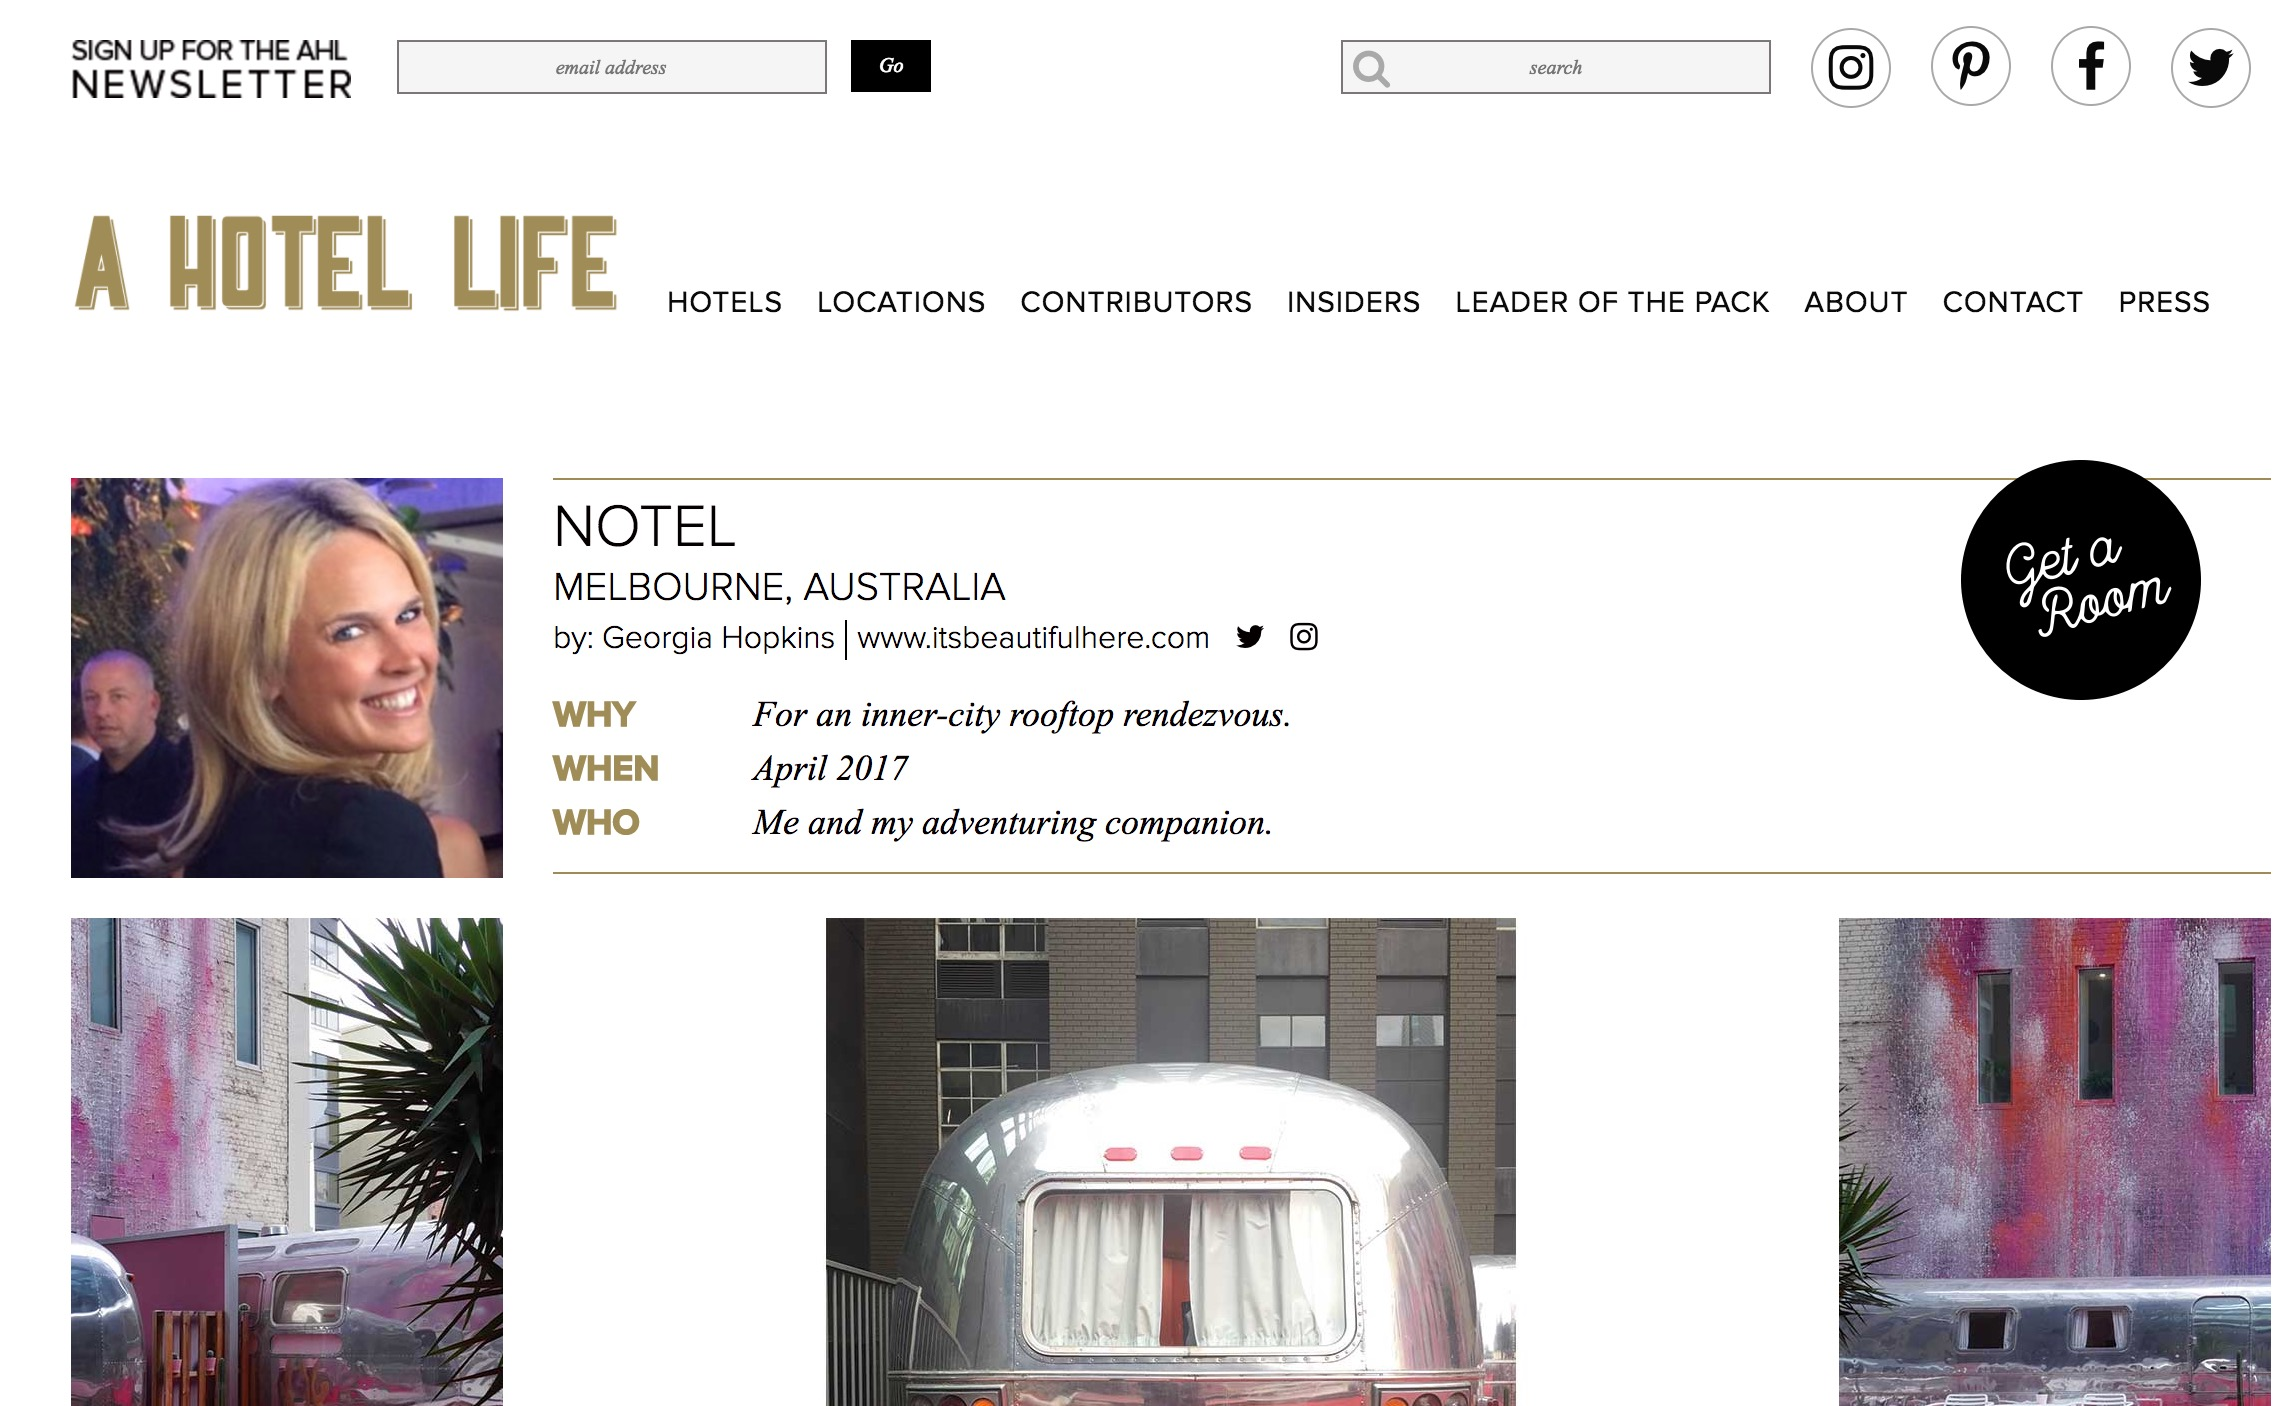 A Hotel Life |  Notel  | April 2017.